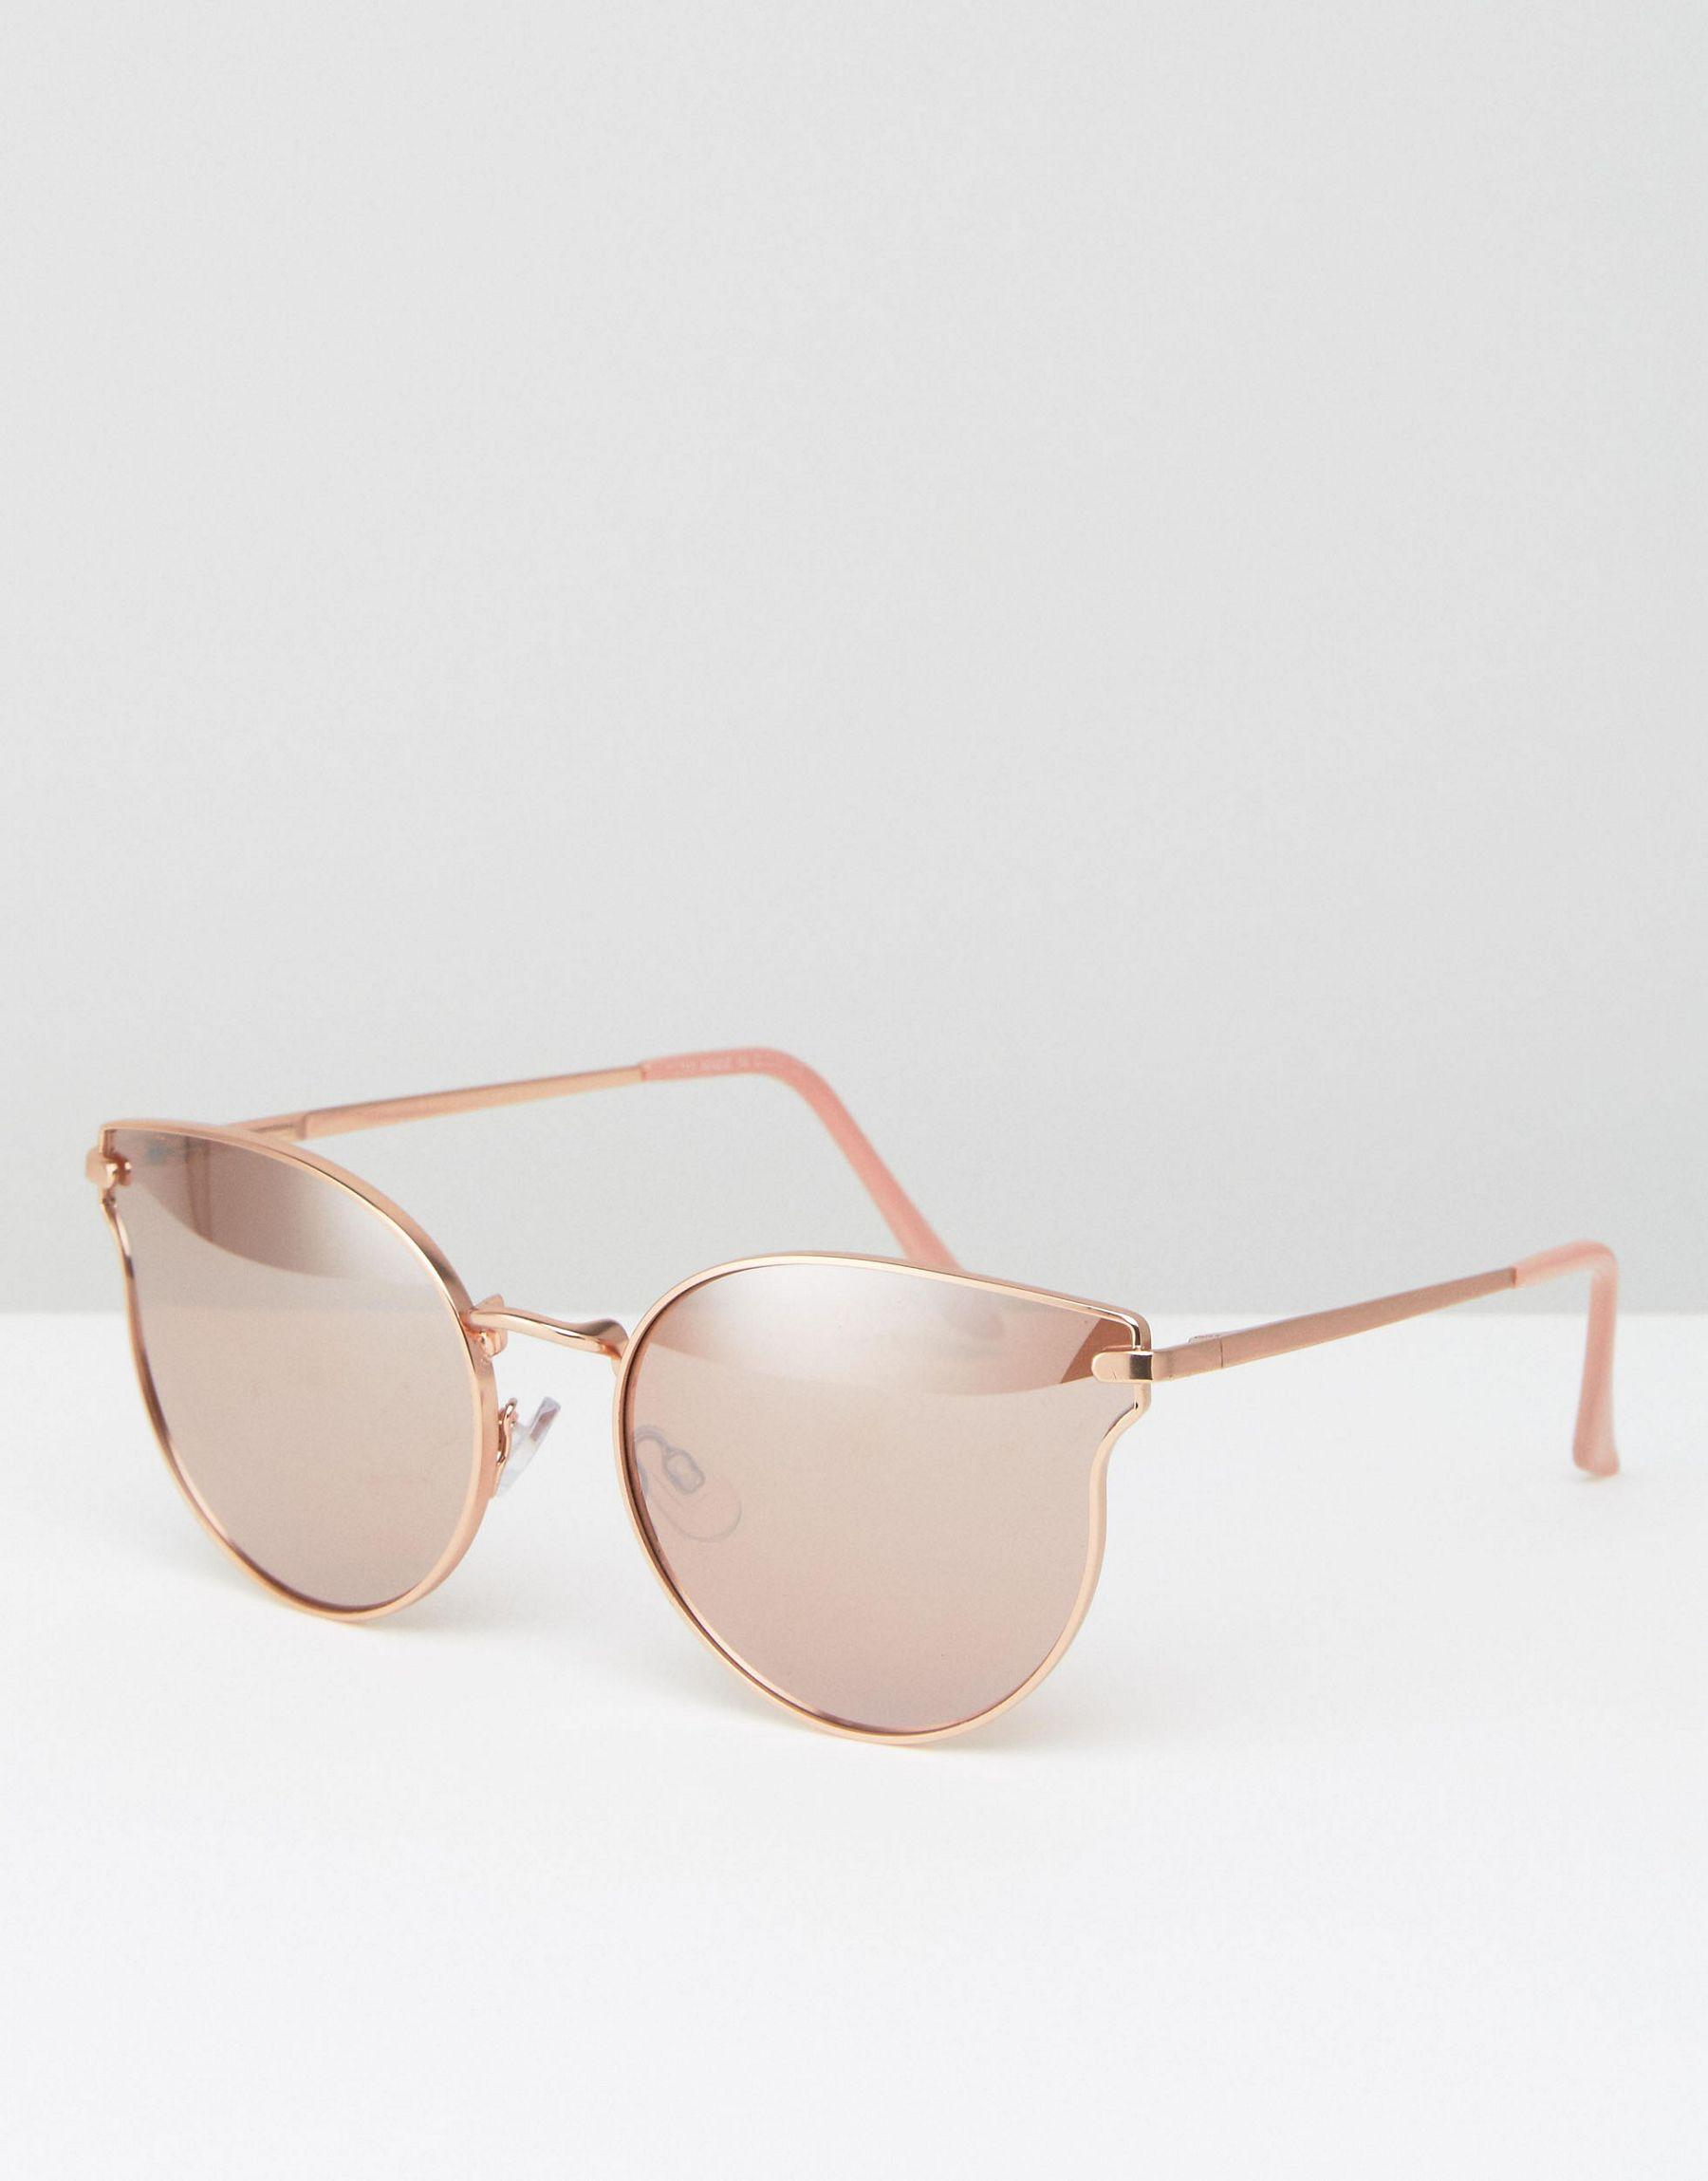 Aldo ldo cat eye sunglasses in rose gold in pink lyst for Miroir rose gold